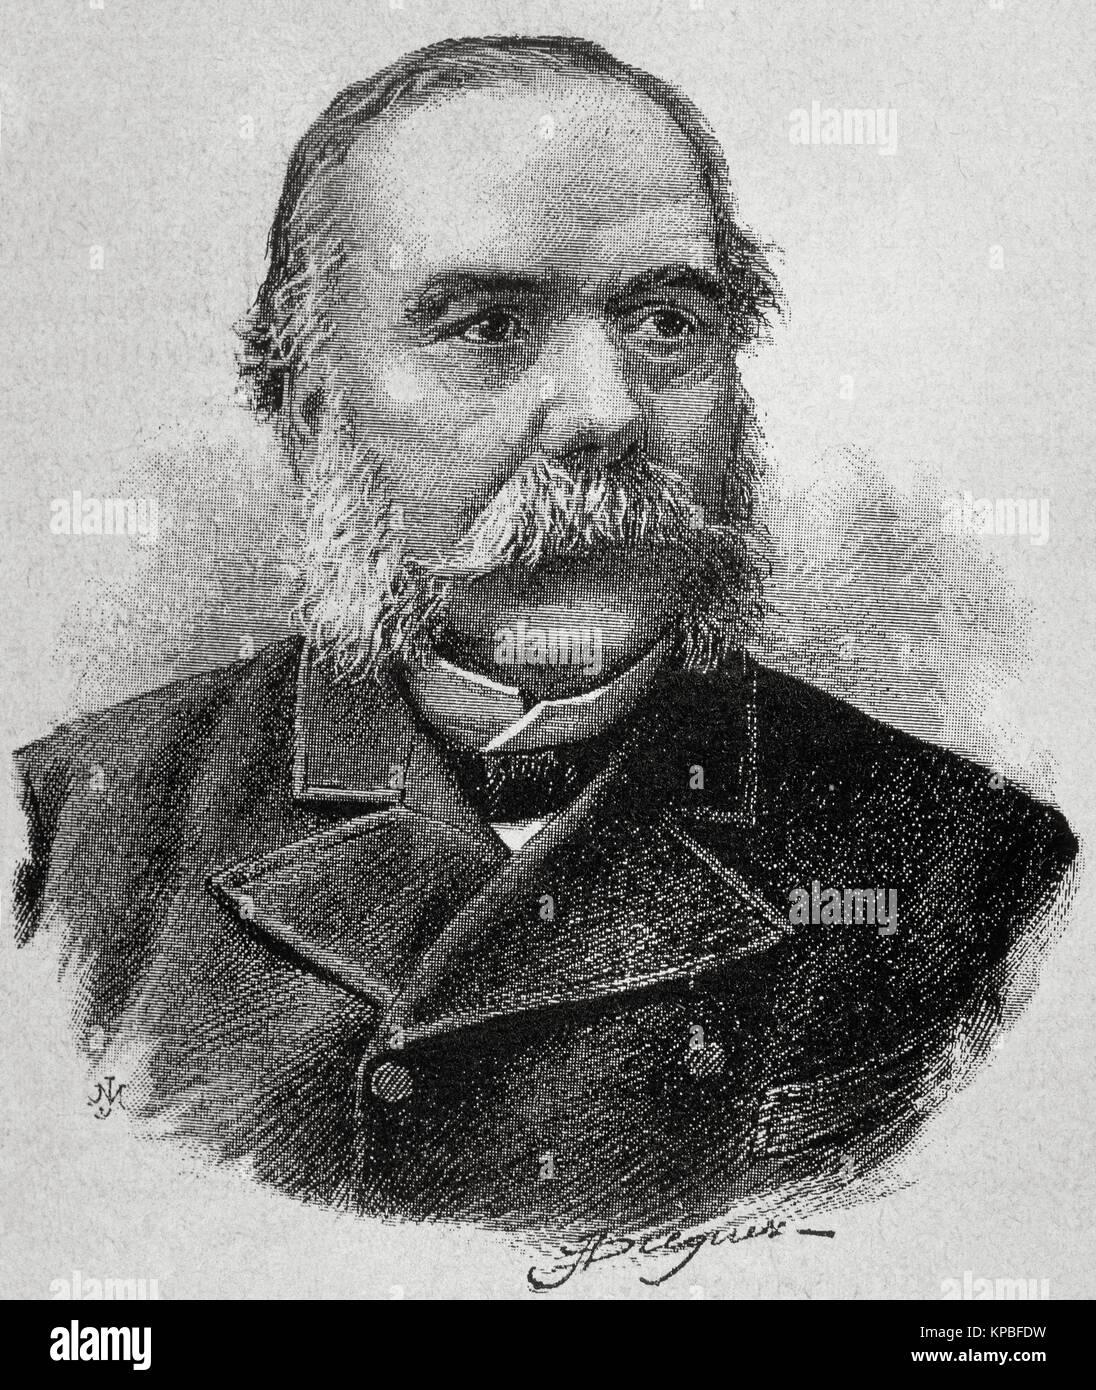 Jose Ferrer Vidal (1817-1893). Catalan industrialist, economist and politician. Portrait. Engraving. - Stock Image